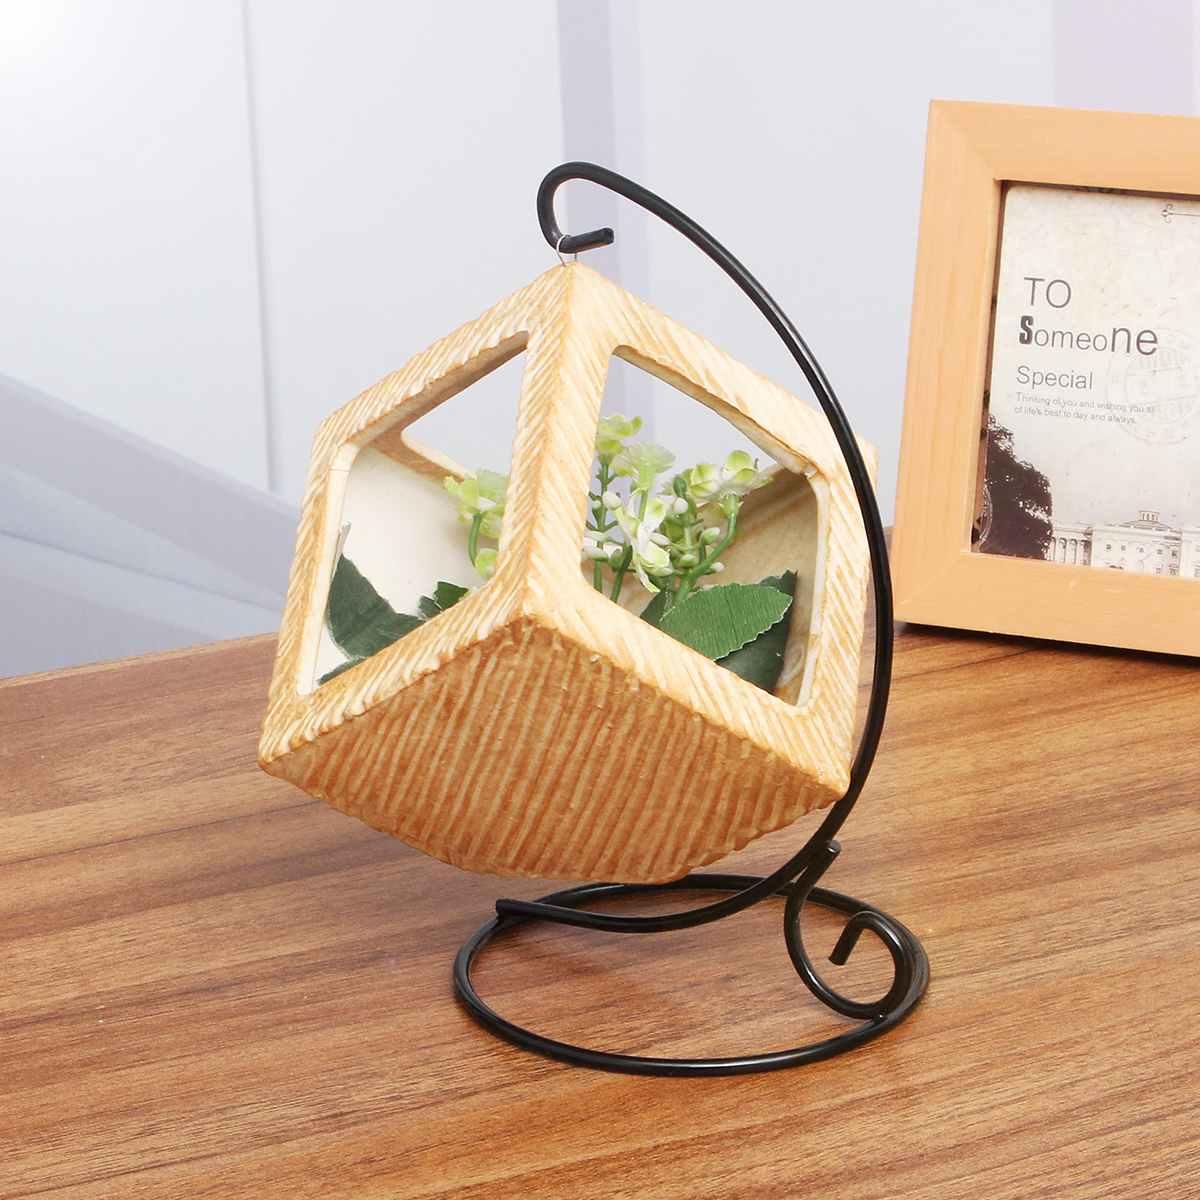 Iron Frame Hanging Basket Planter Pot Storage Holders Balcony Decorative Flower Vase Plants Racks for Home Office Desk Decor